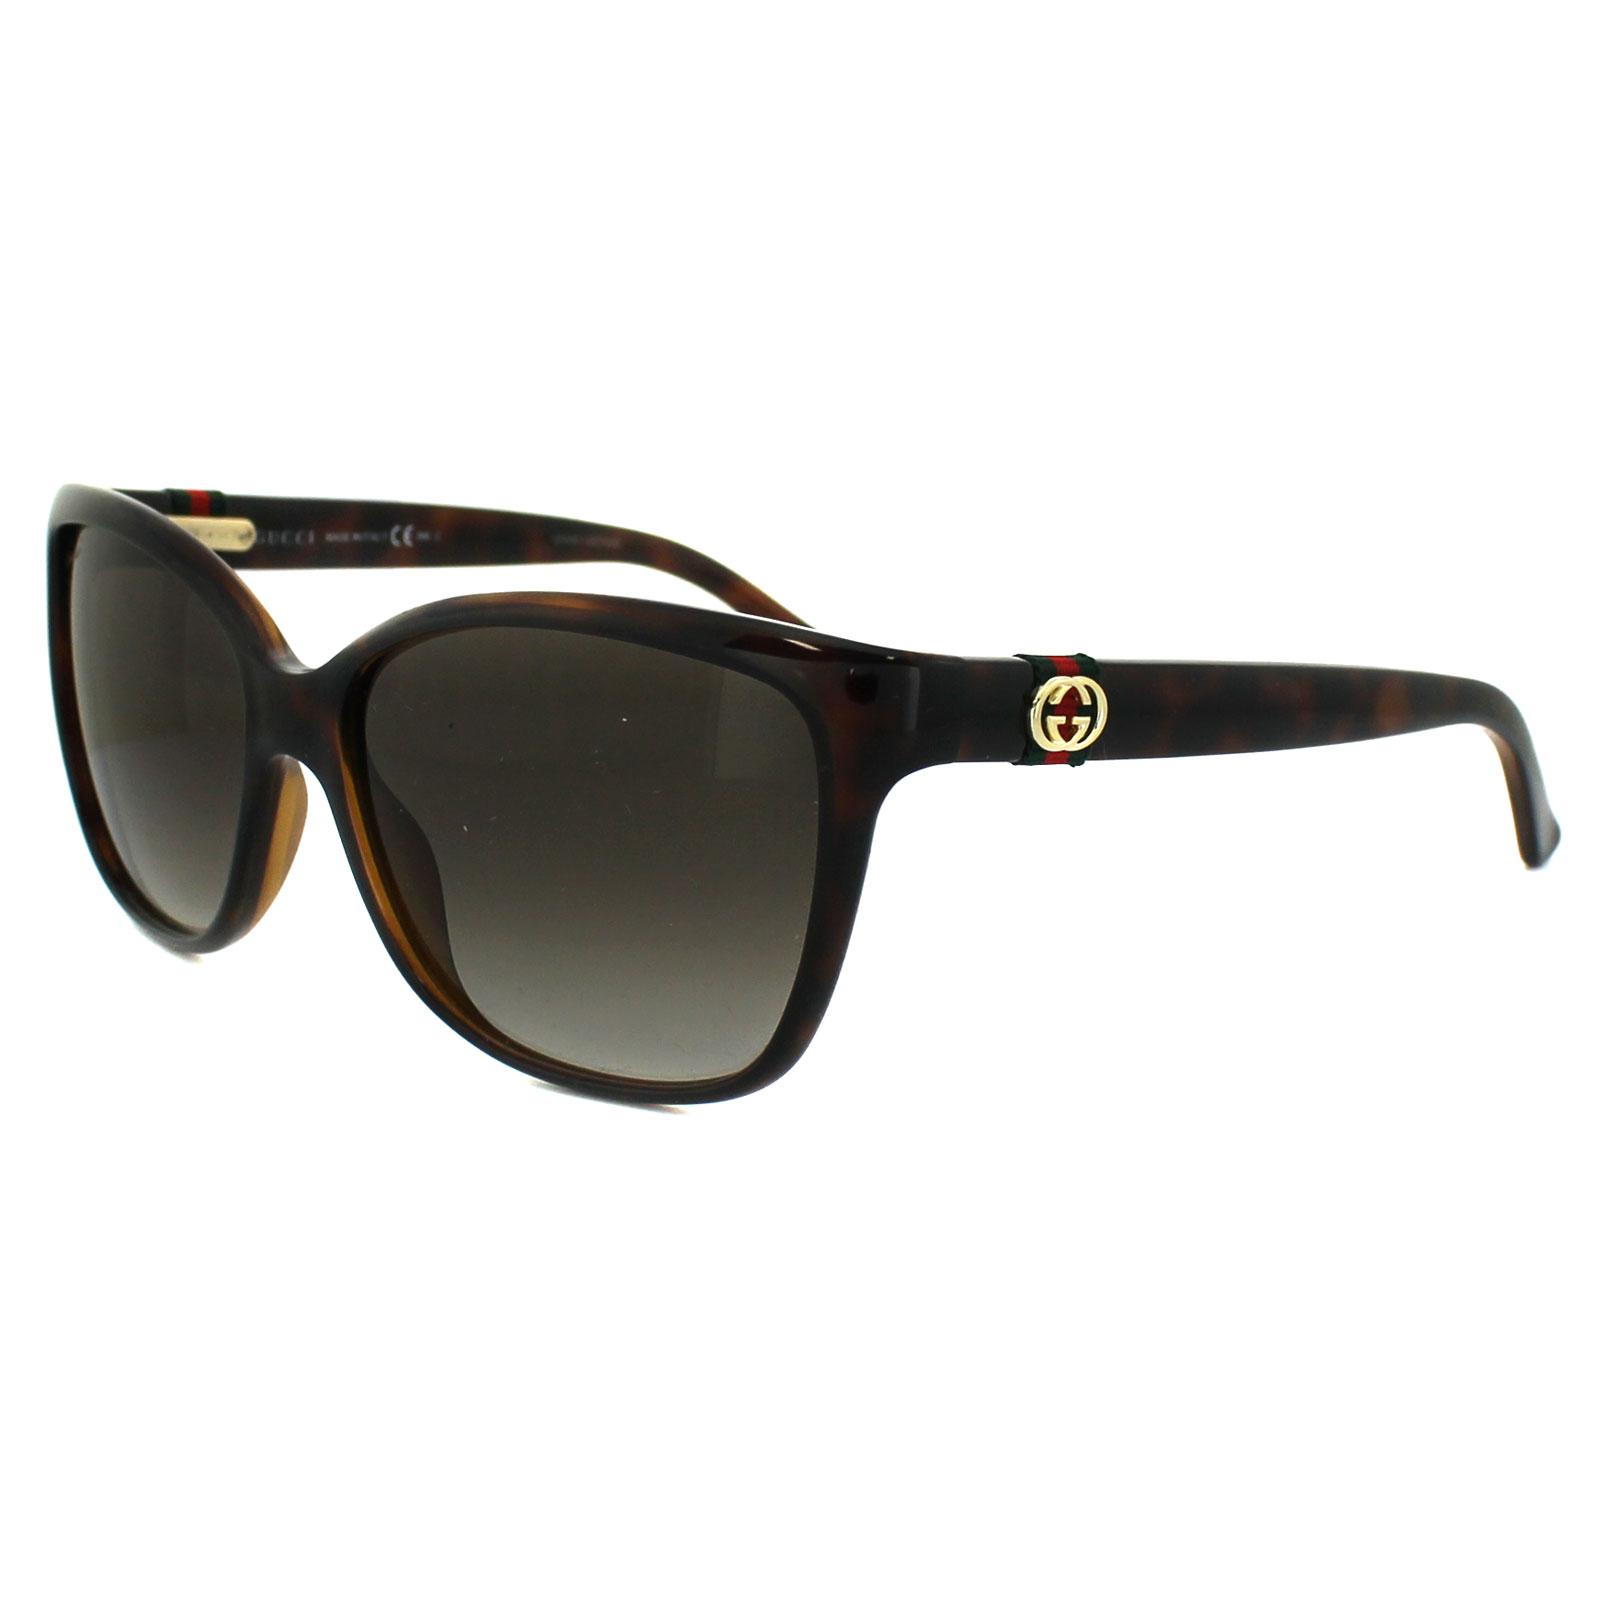 Gucci Gafas de sol 3645 Dwj Ha Havana Marron Degradado | eBay